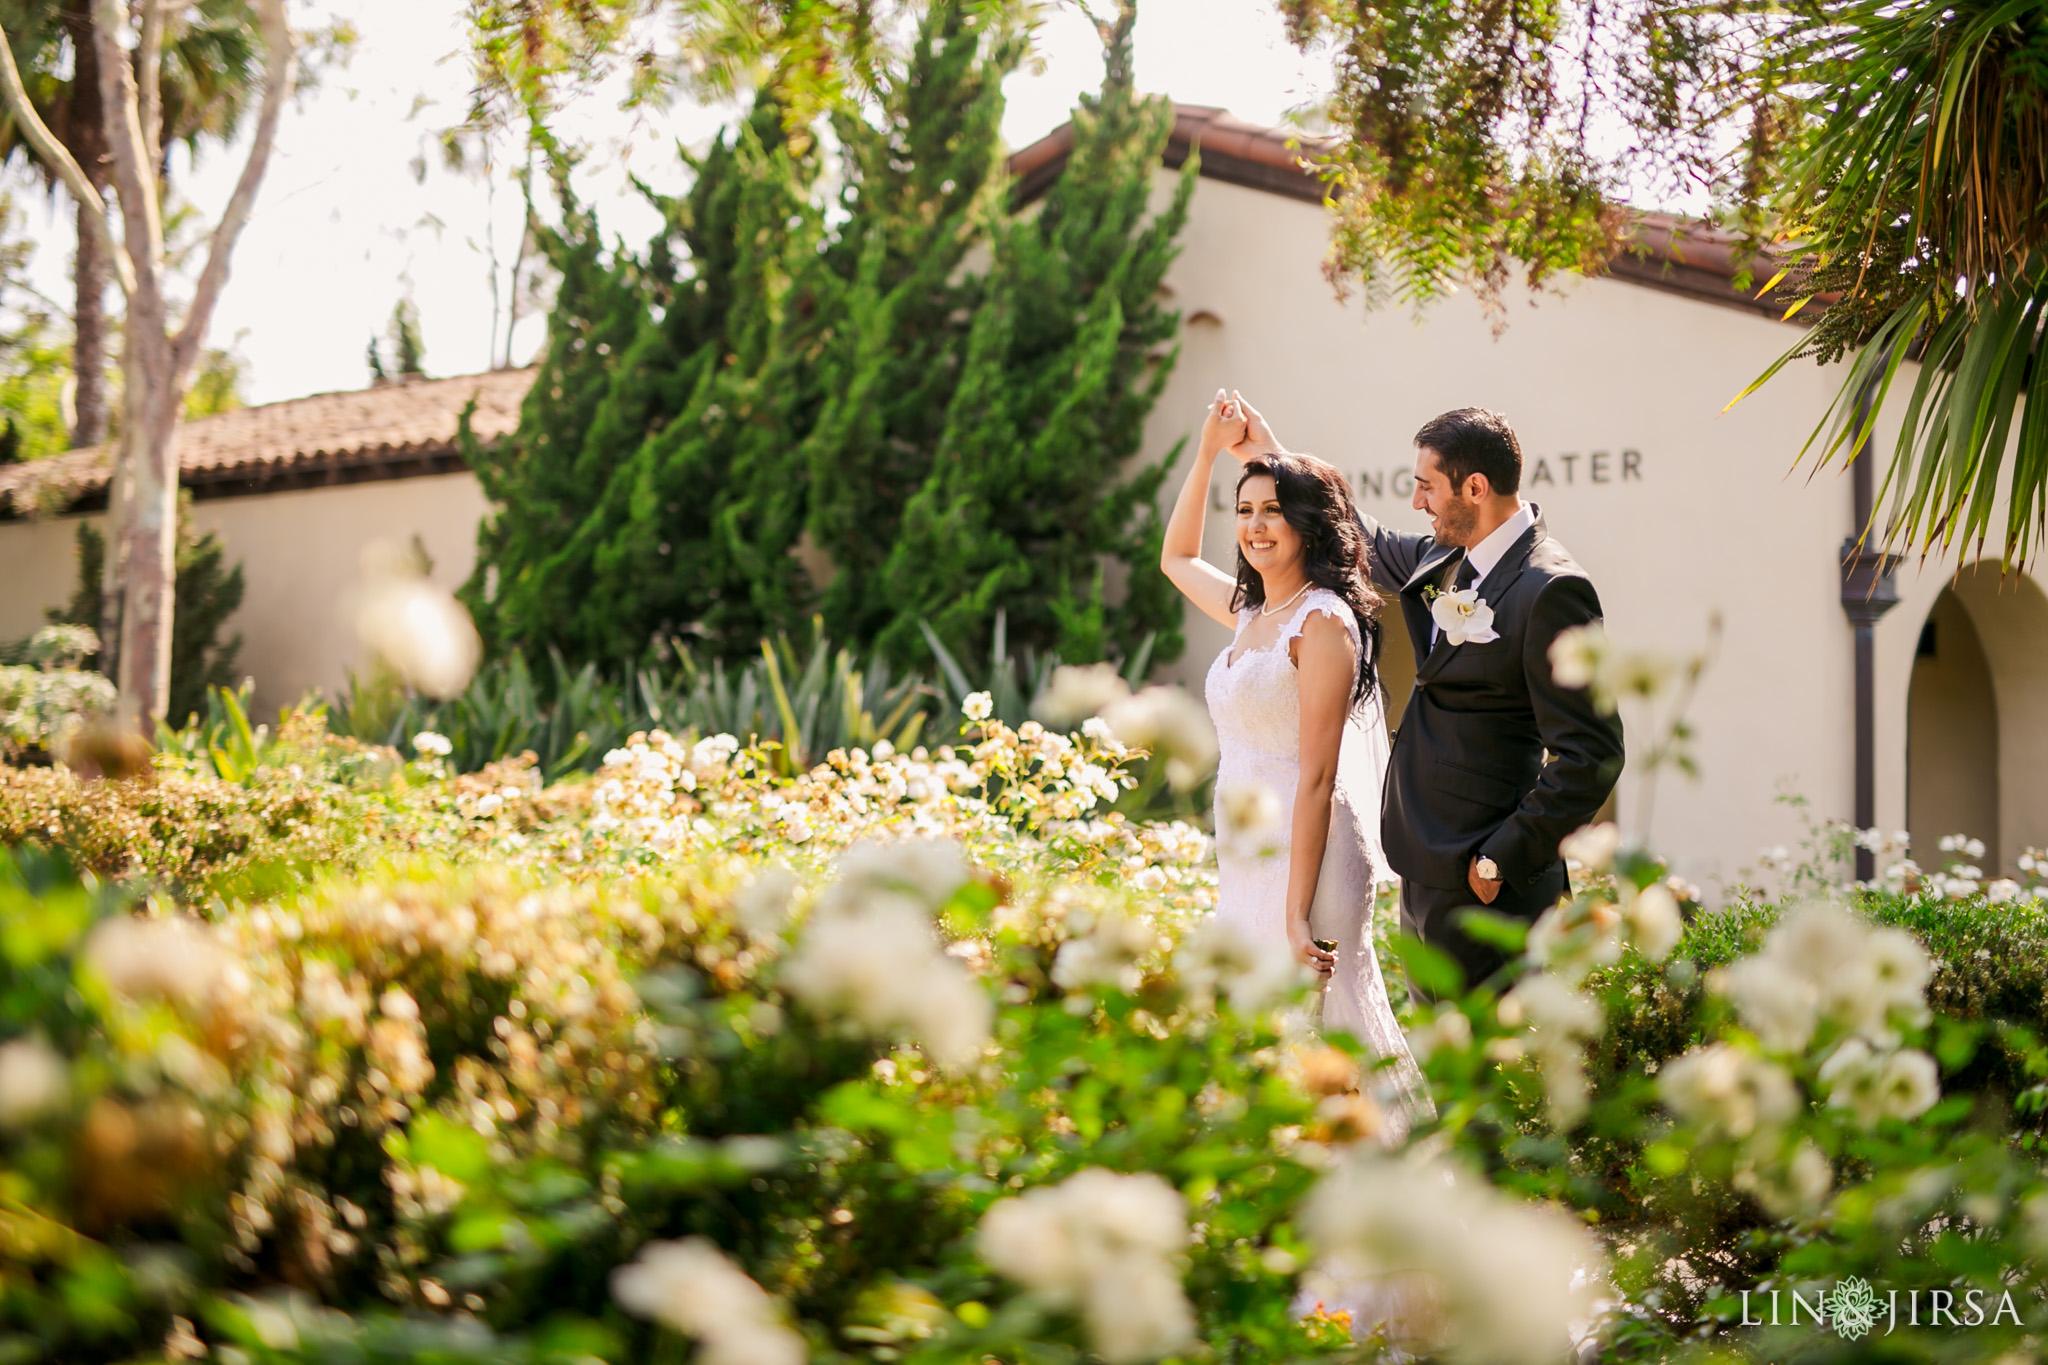 038 estancia la jolla hotel spa persian couple wedding photography